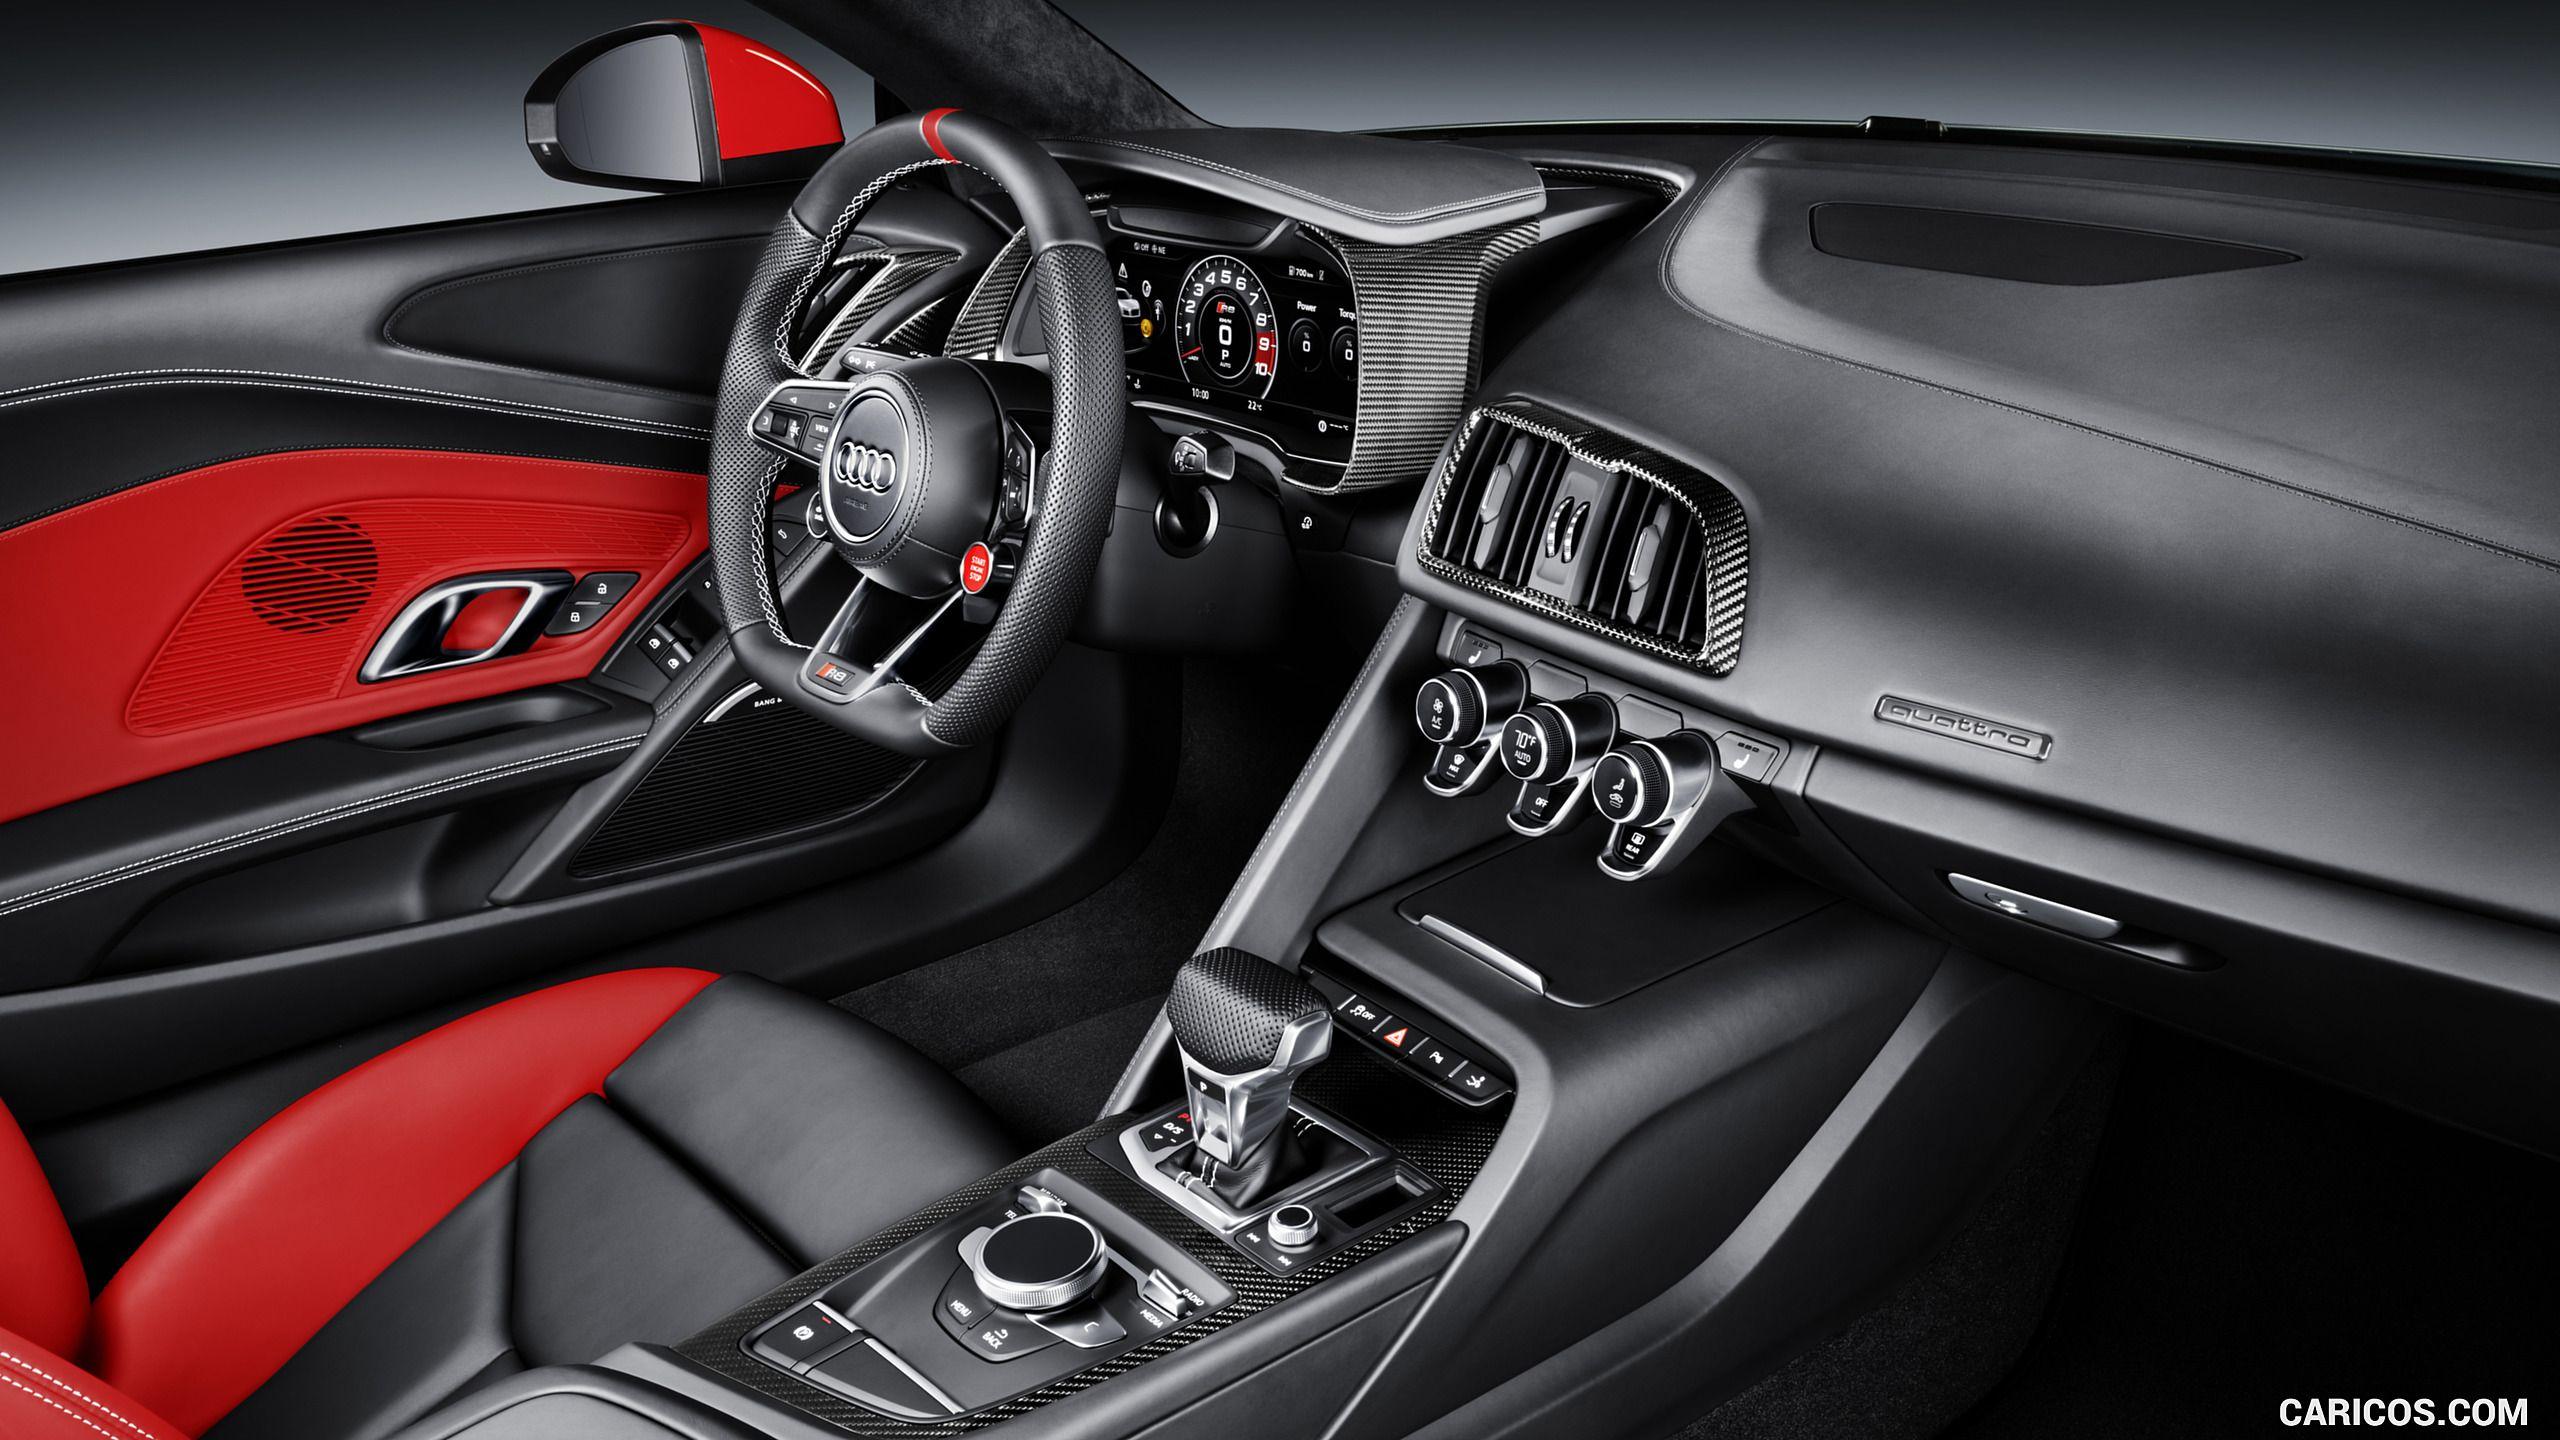 2018 Audi R8 V10 Coupe Edition Audi Sport Wallpaper